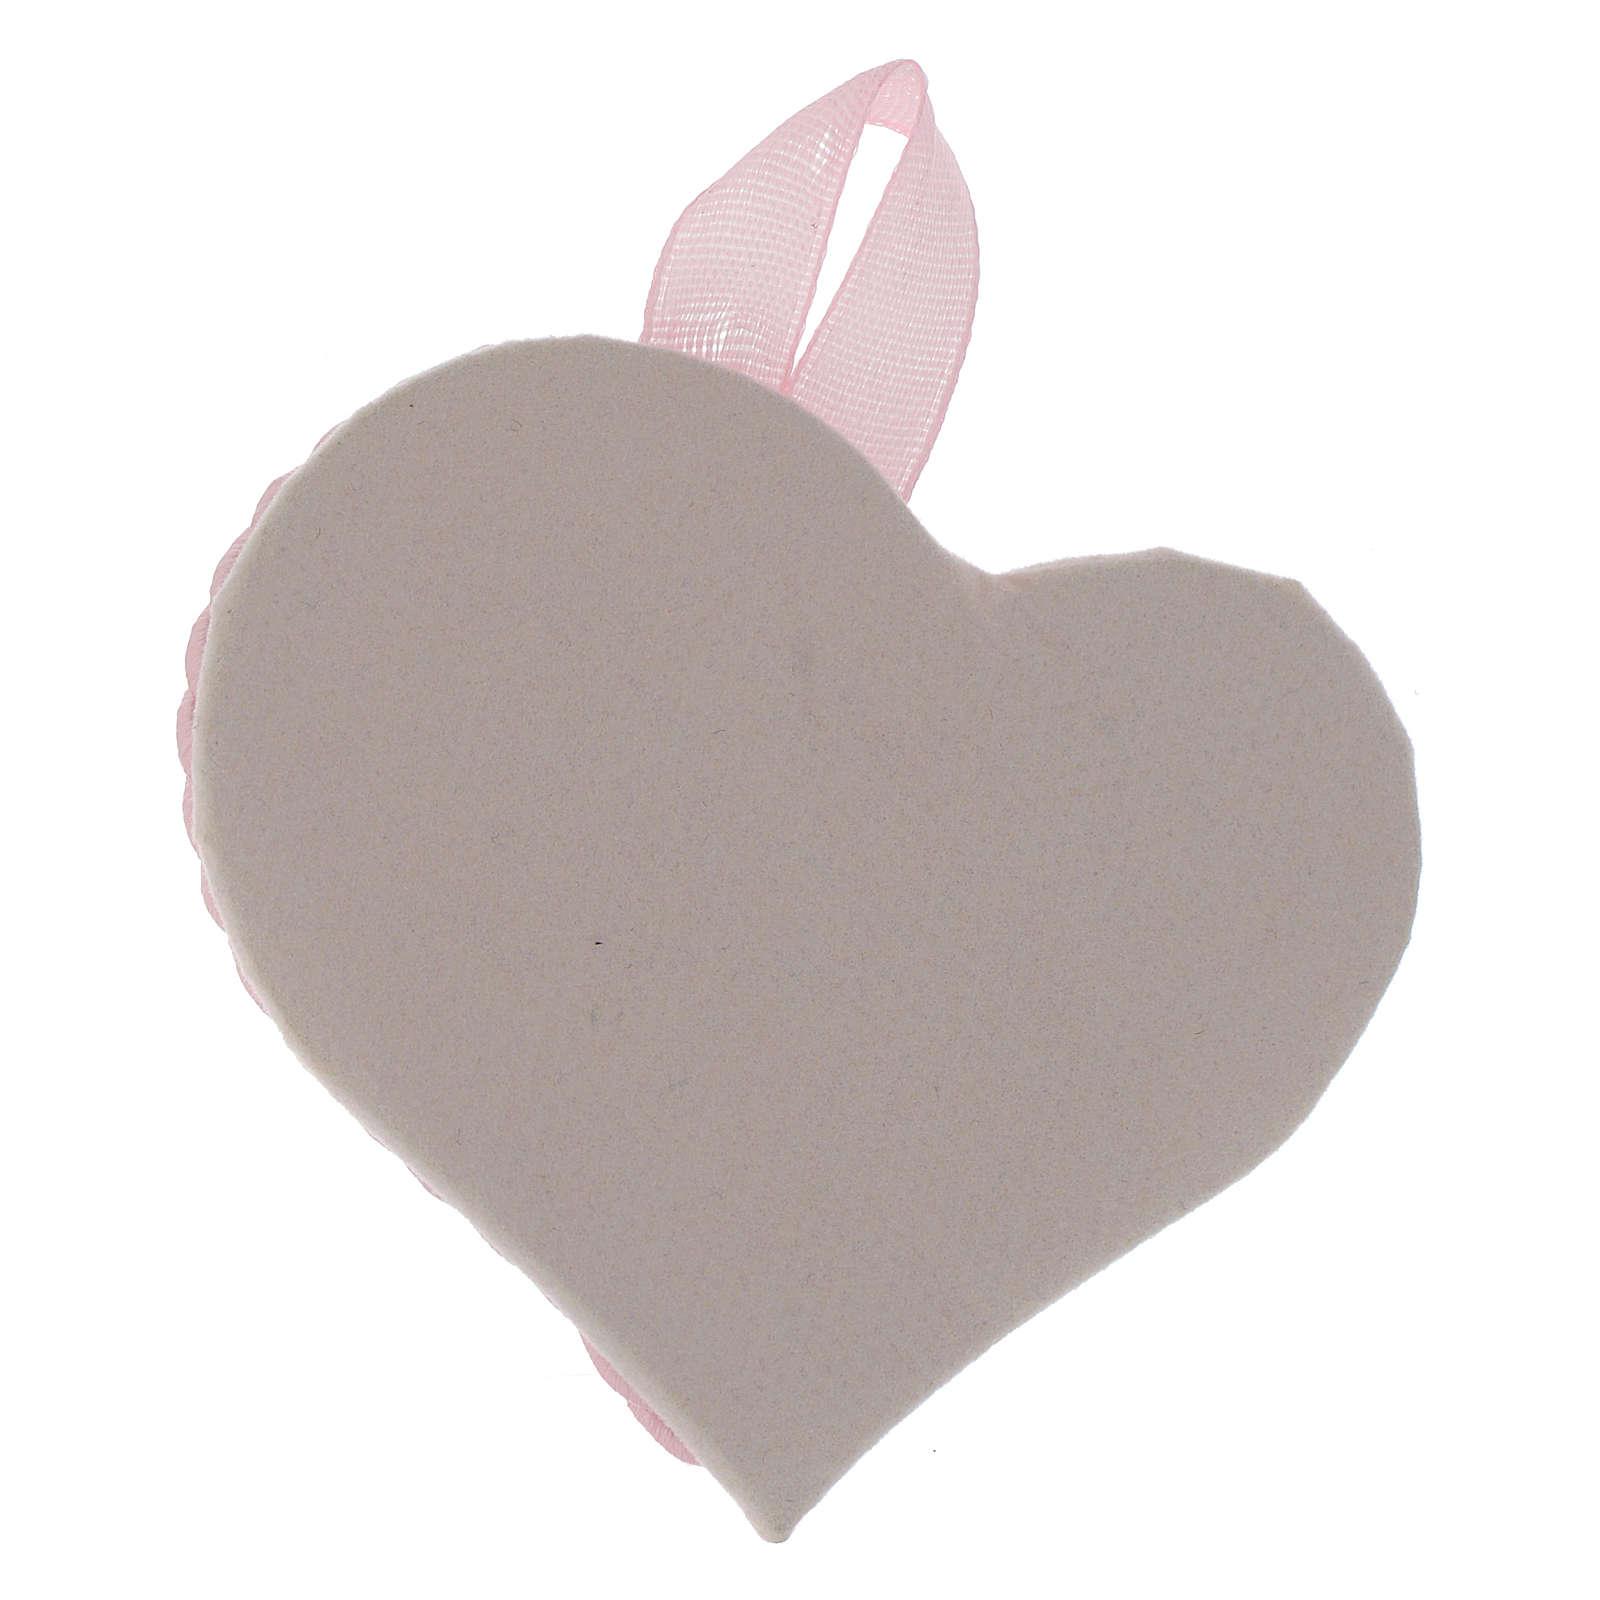 Obrazek nad kołyskę srebrny Serce Anioł Stróż różowy medalion 4